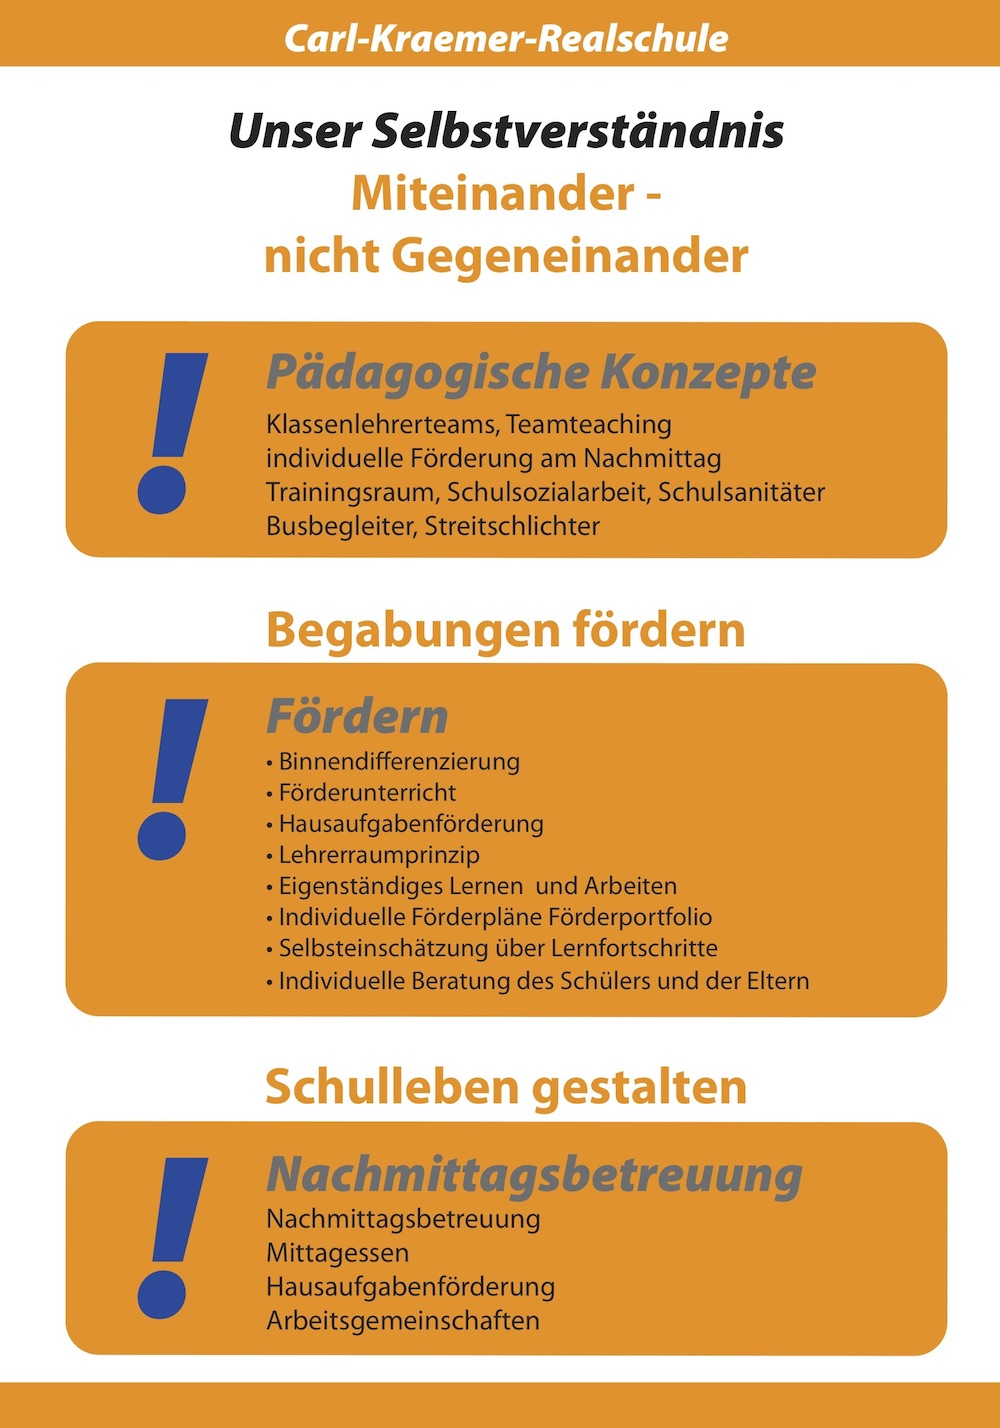 ckr_uebersicht4.jpg